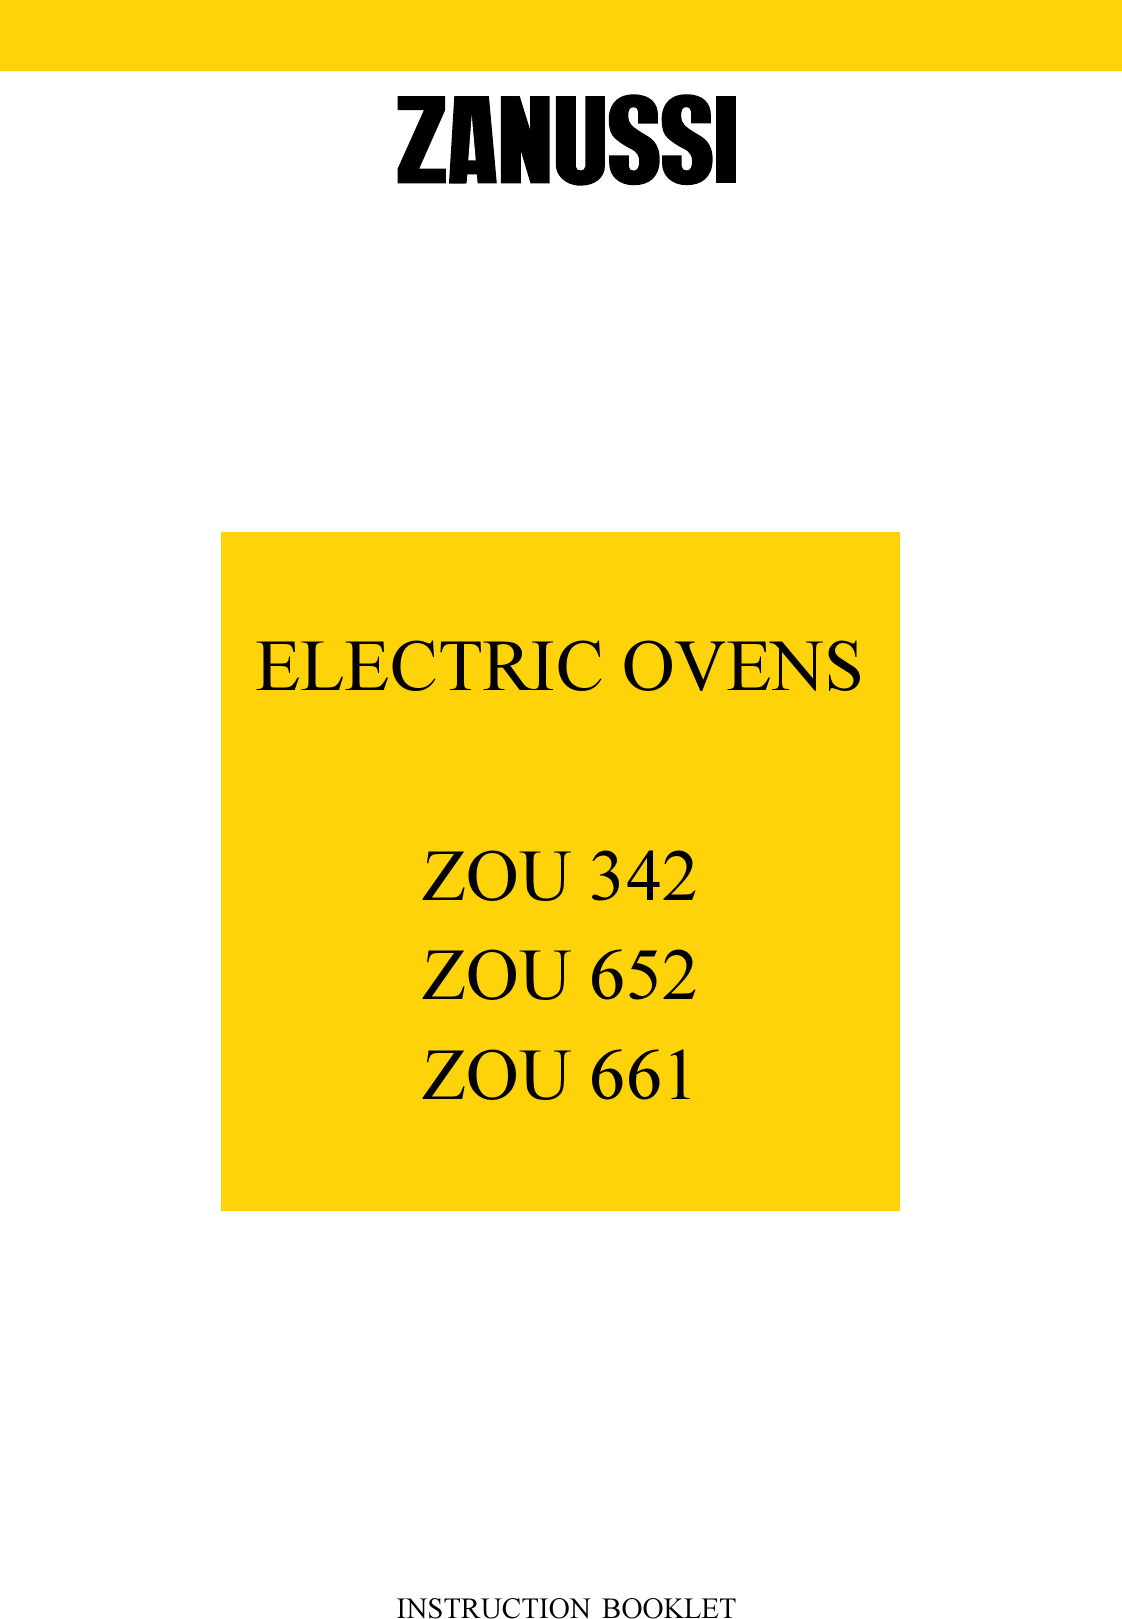 Zanussi Zou 342 Users Manual